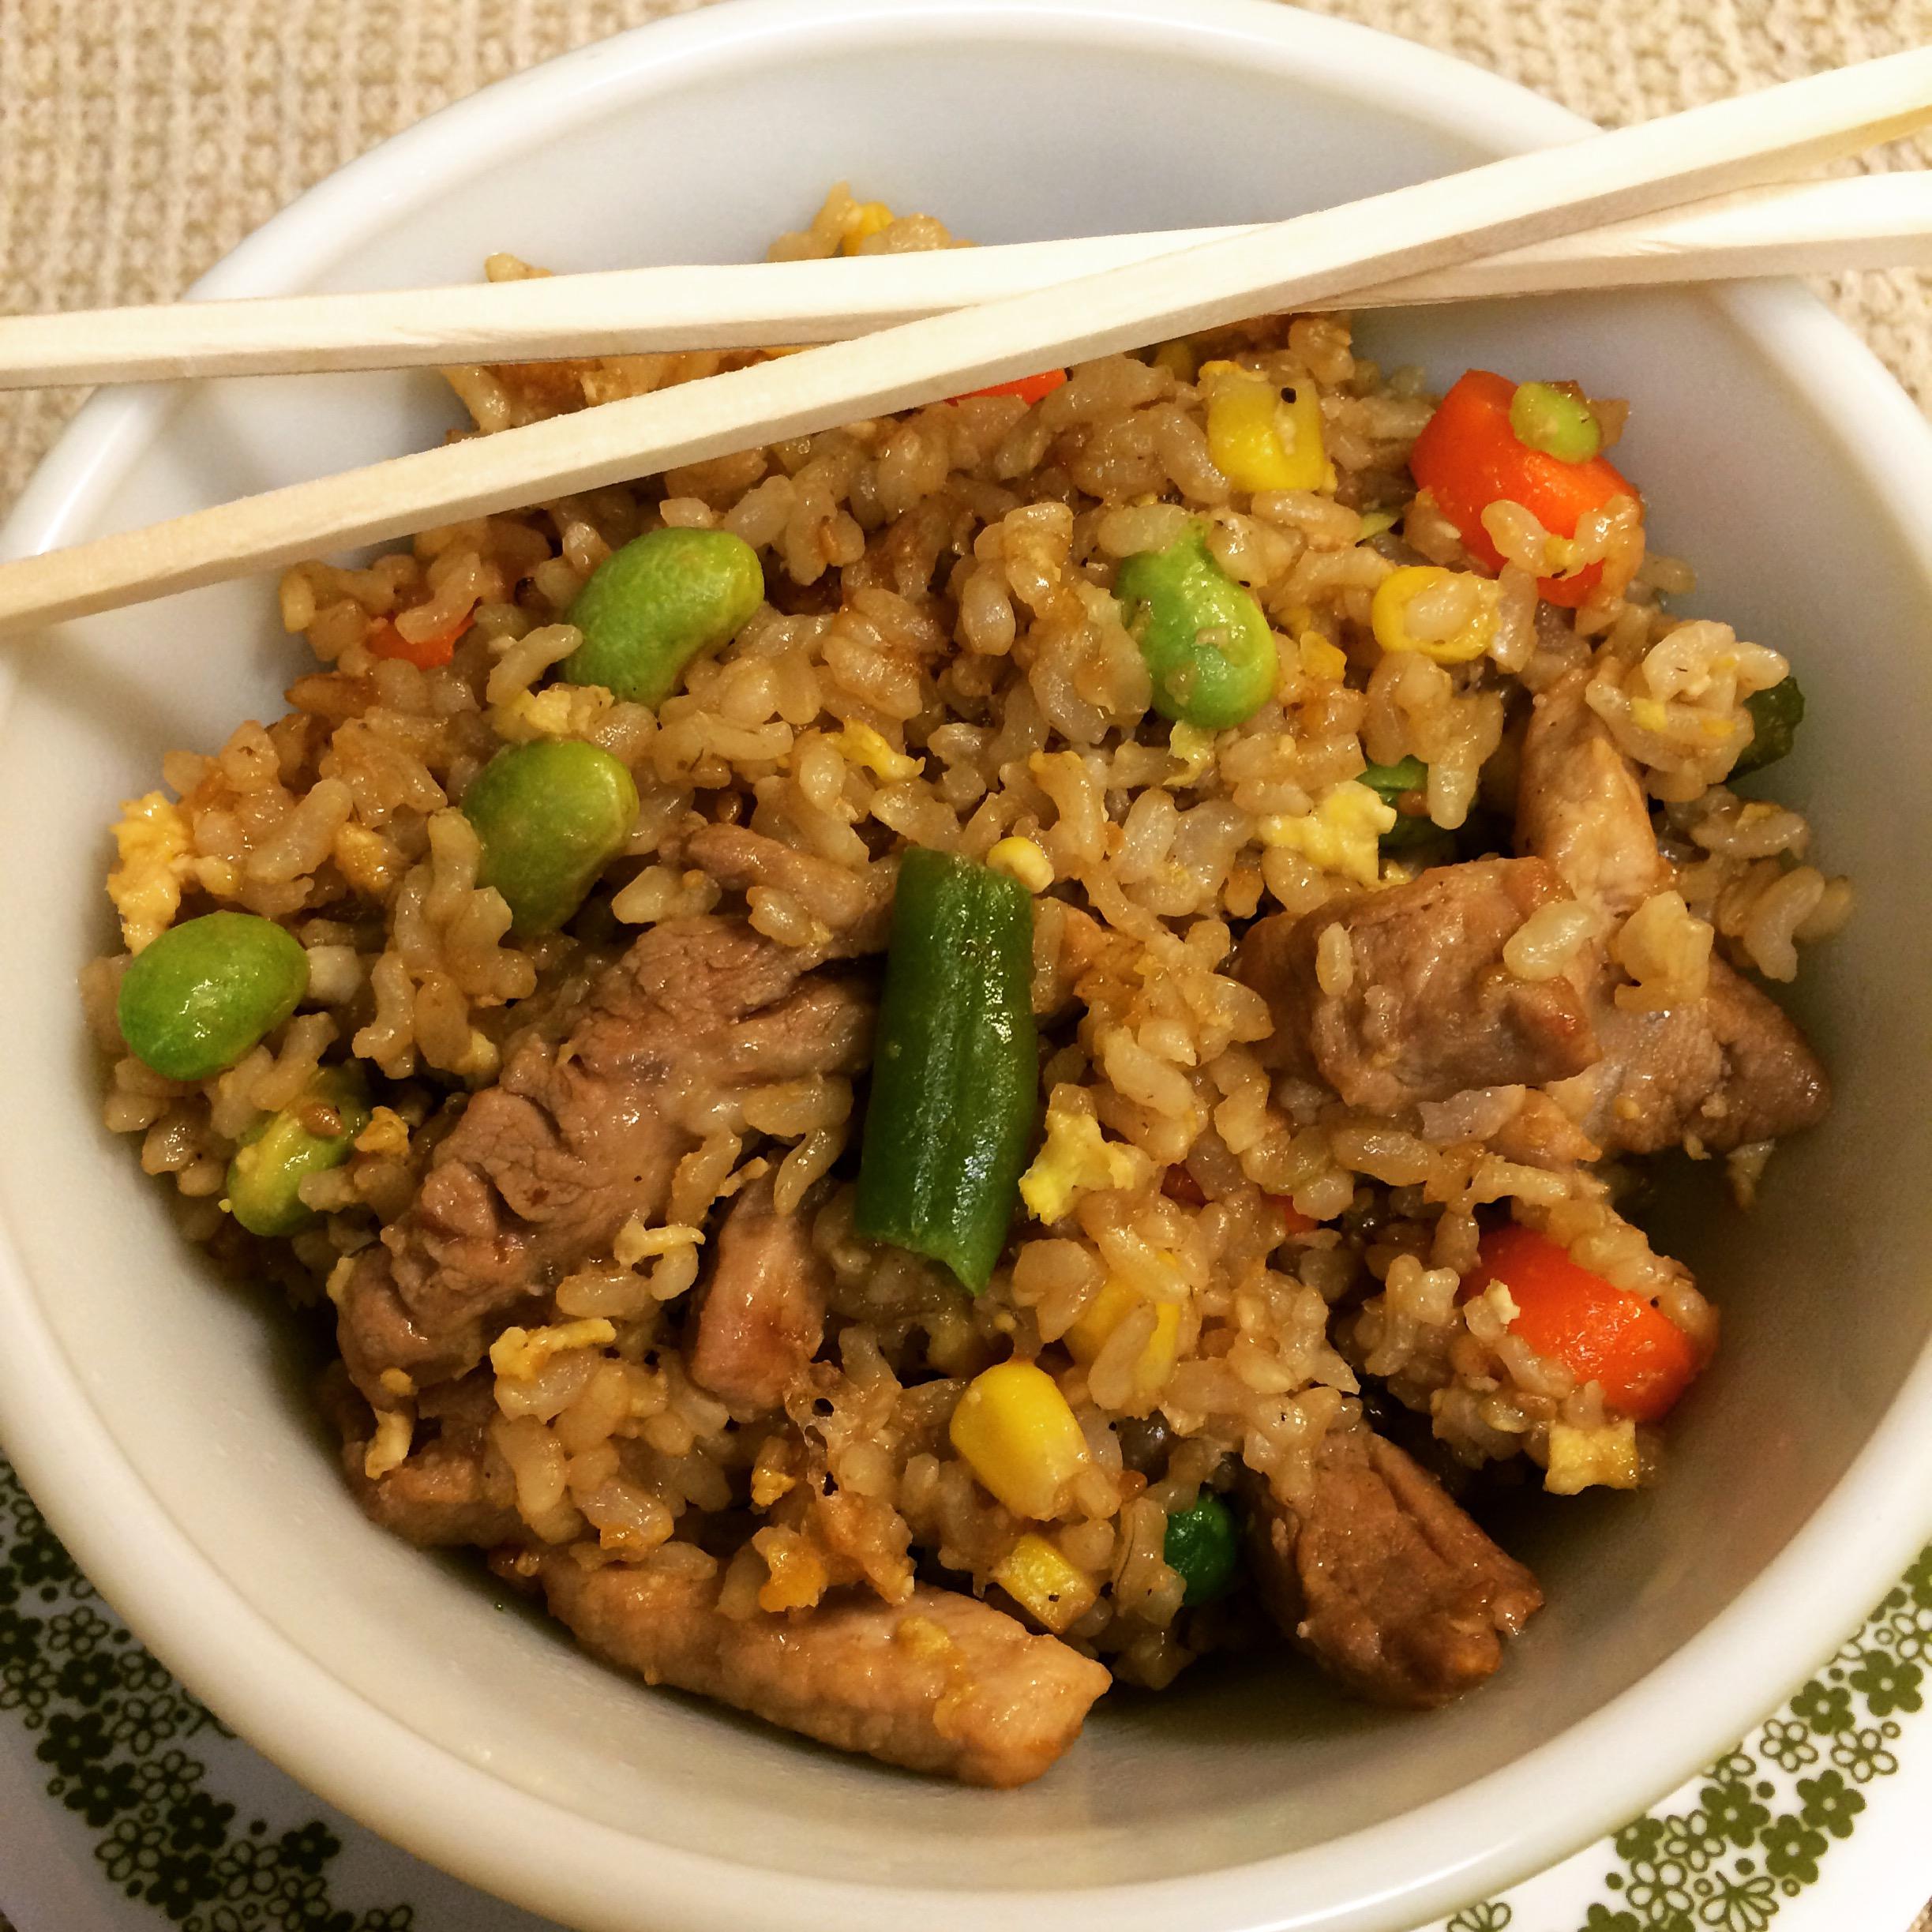 How To Make Chinese Restaurant Pork Fried Rice